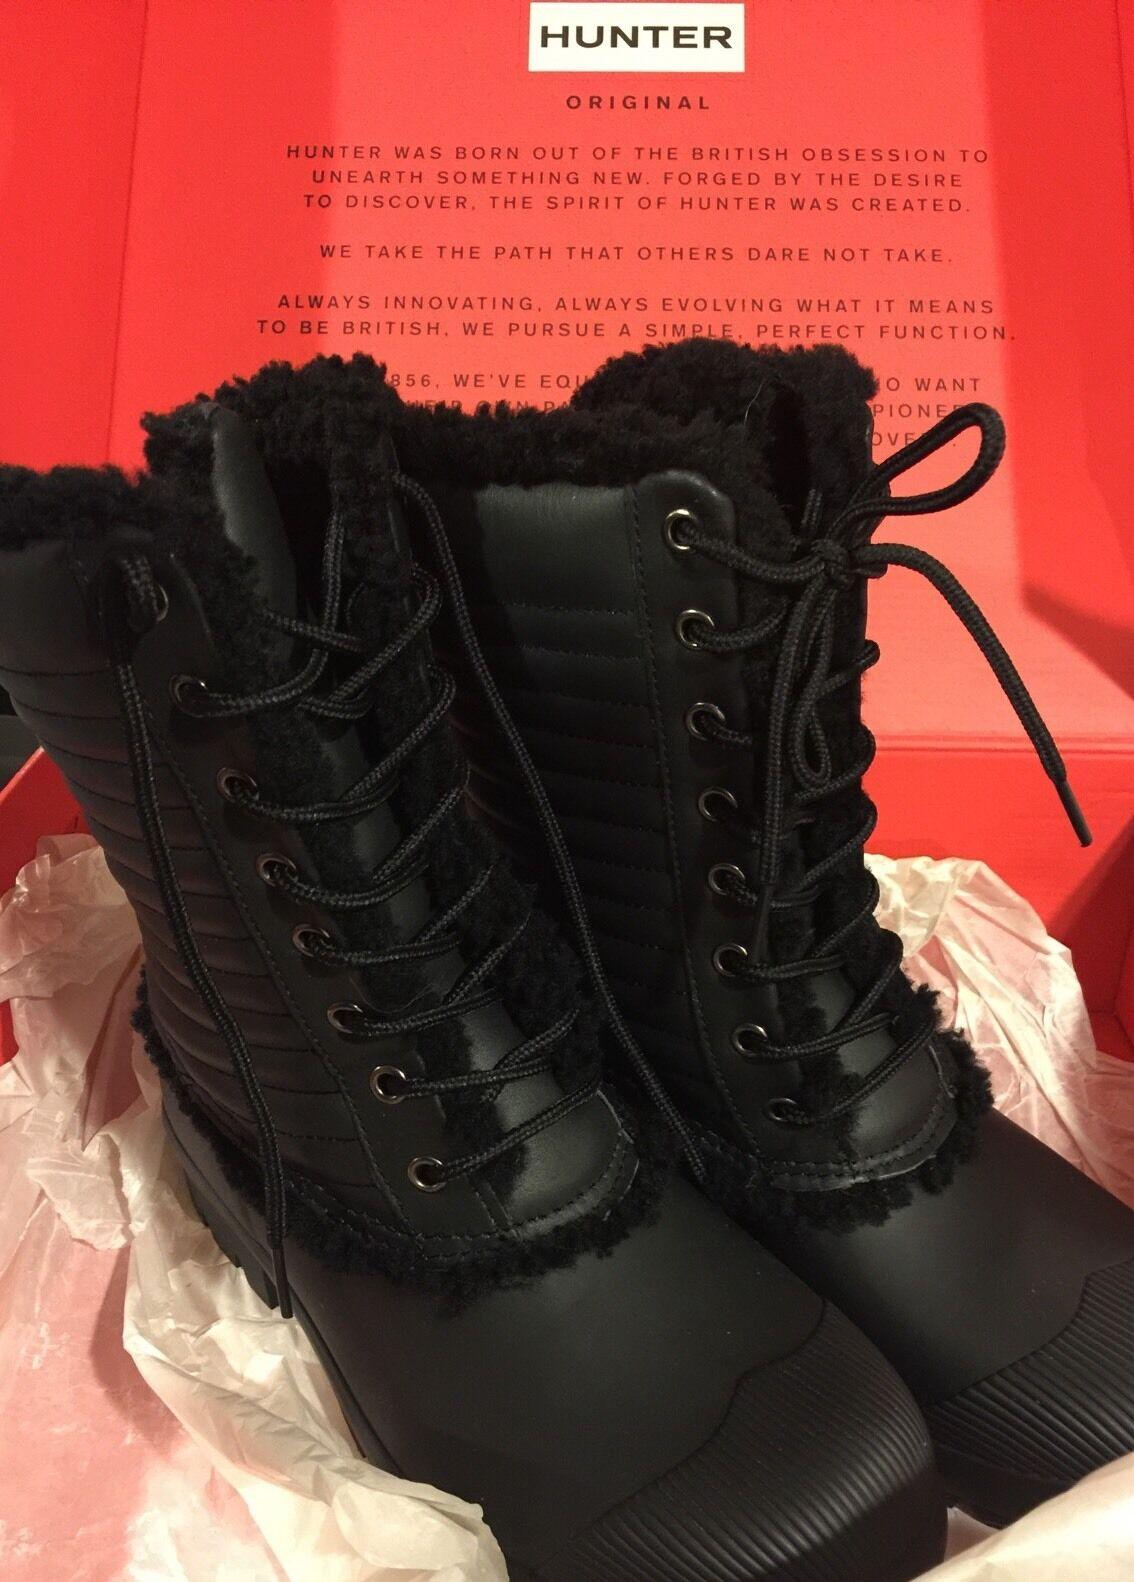 Hunter Original Genuino Shearling patente PAC Laceup botas De Lluvia Lluvia Lluvia Para Mujer 9  comprar ahora